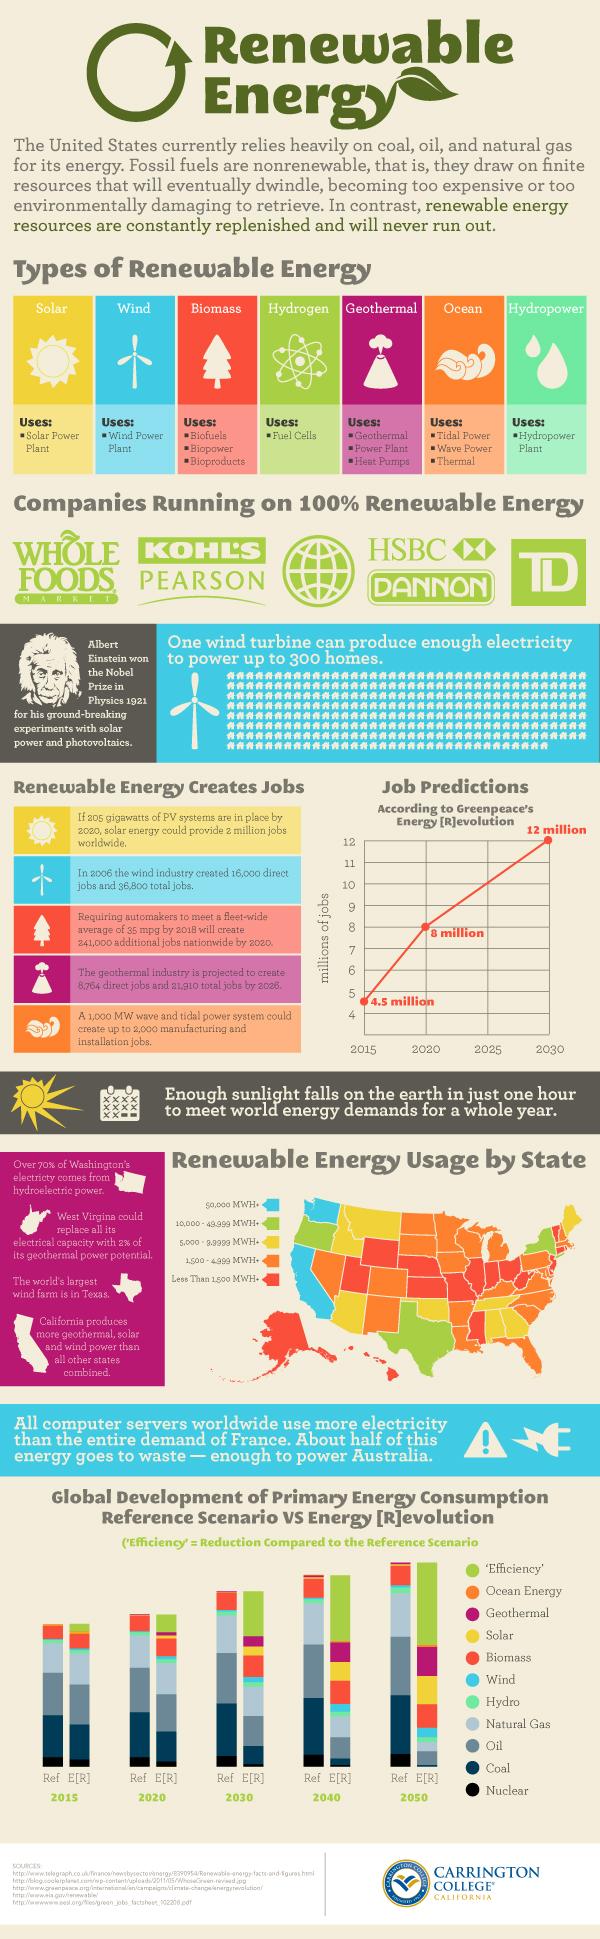 Renewable Energy Future